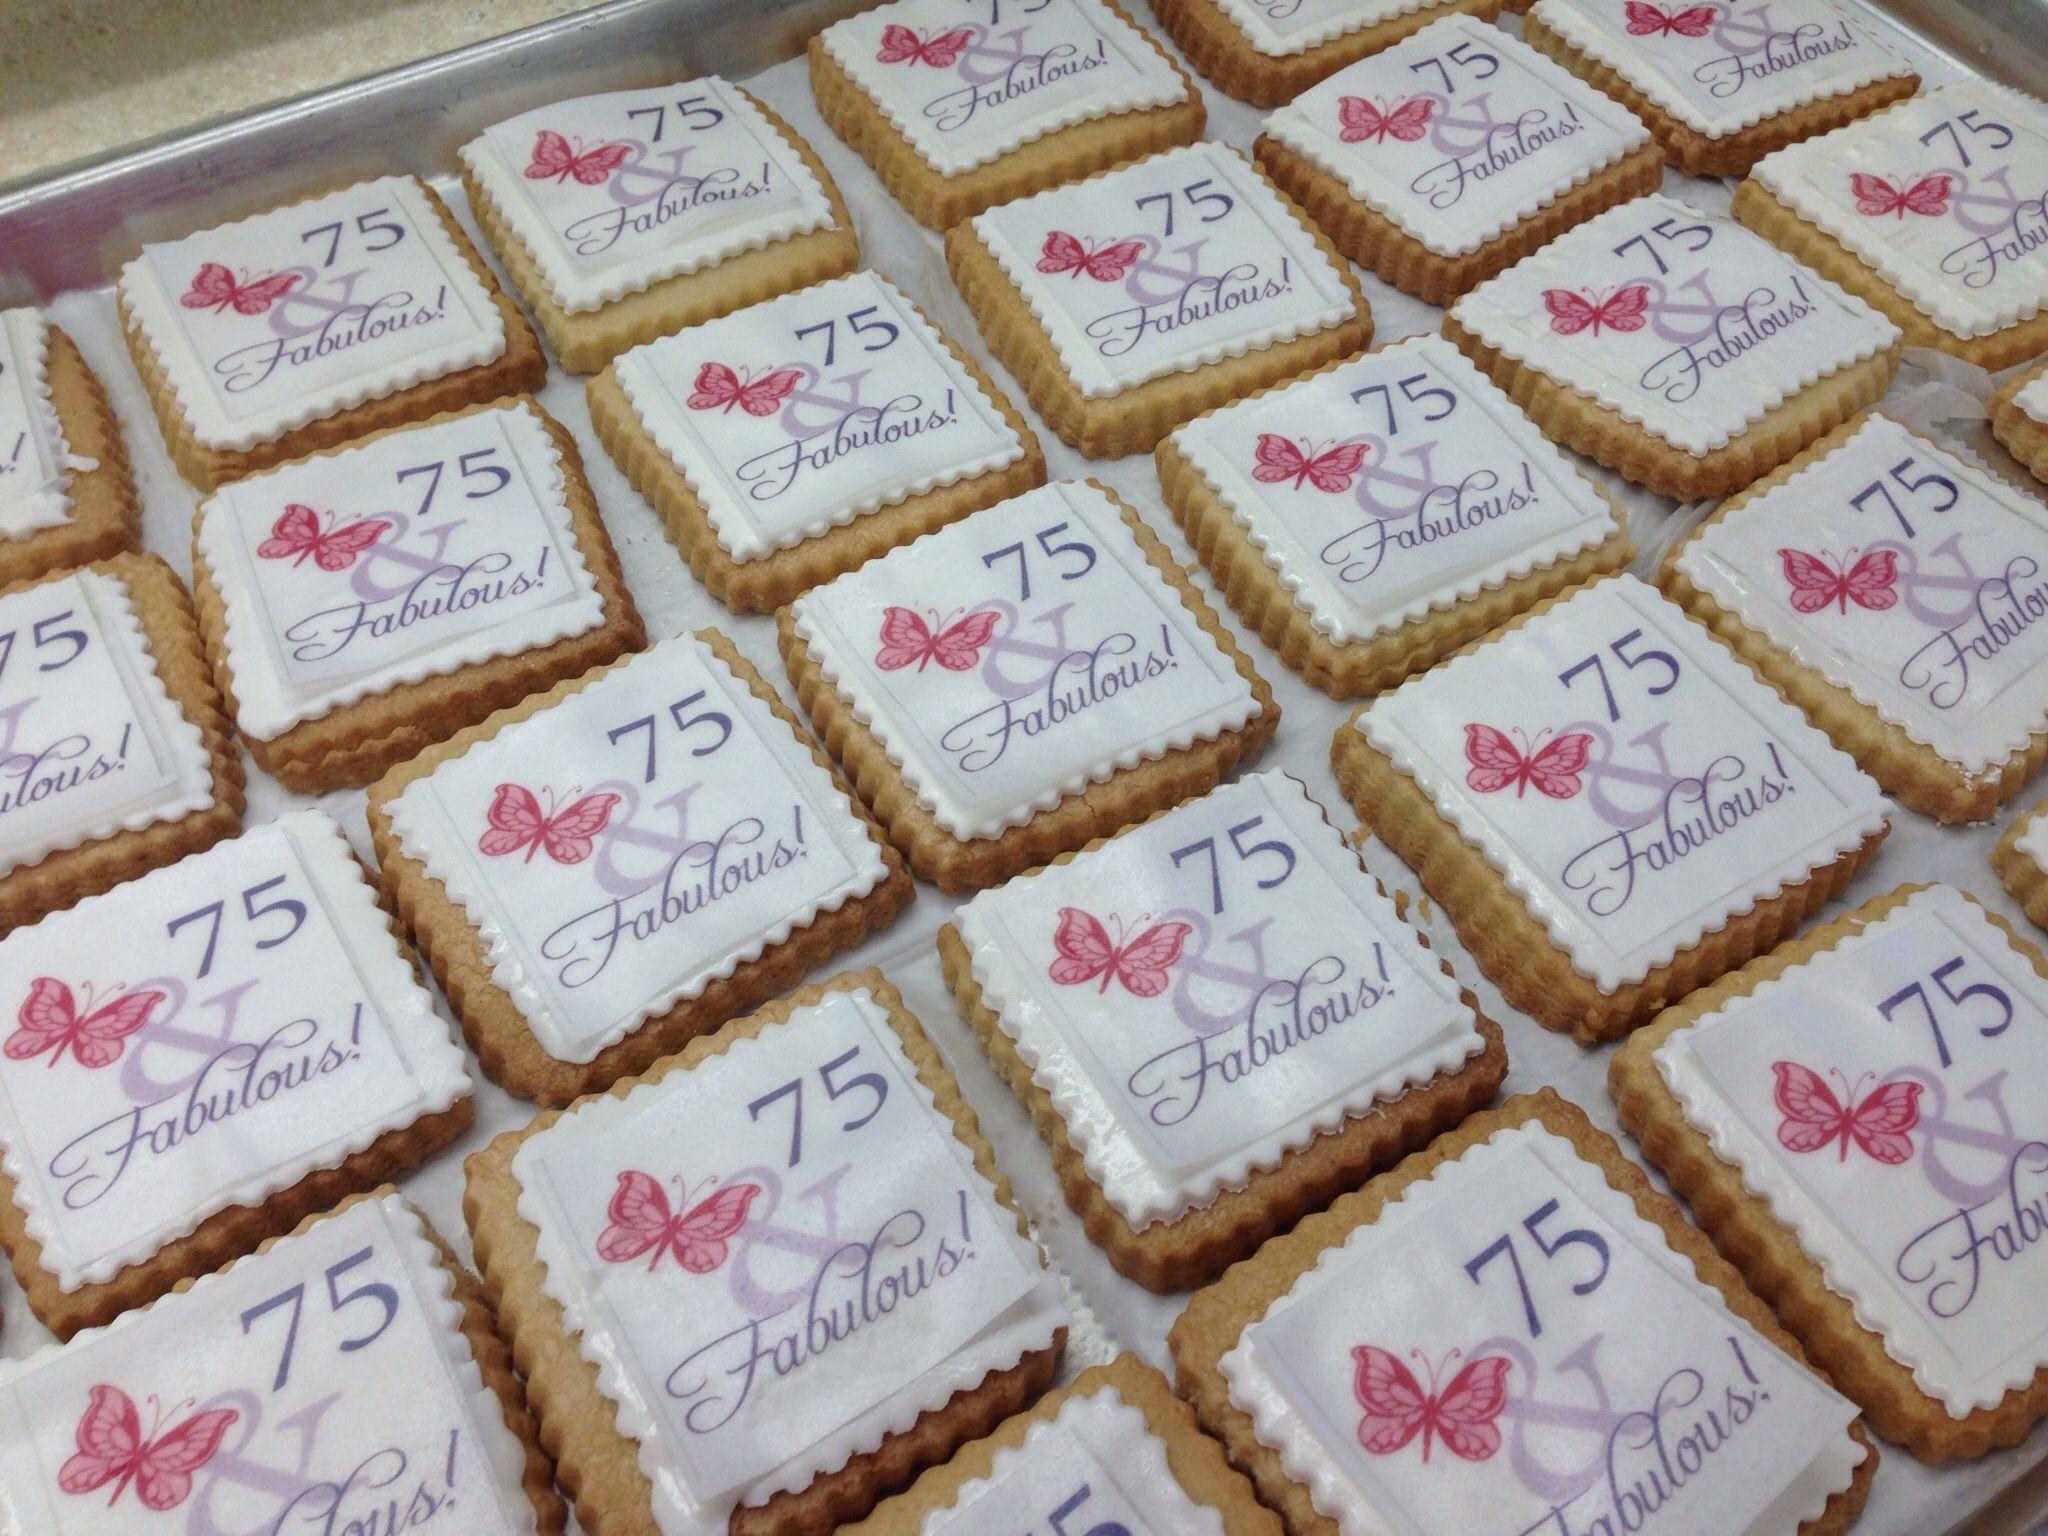 6th Wedding Anniversary Sugar Gifts: 75th Birthday Favor Cookies #cookies #livaygoodies